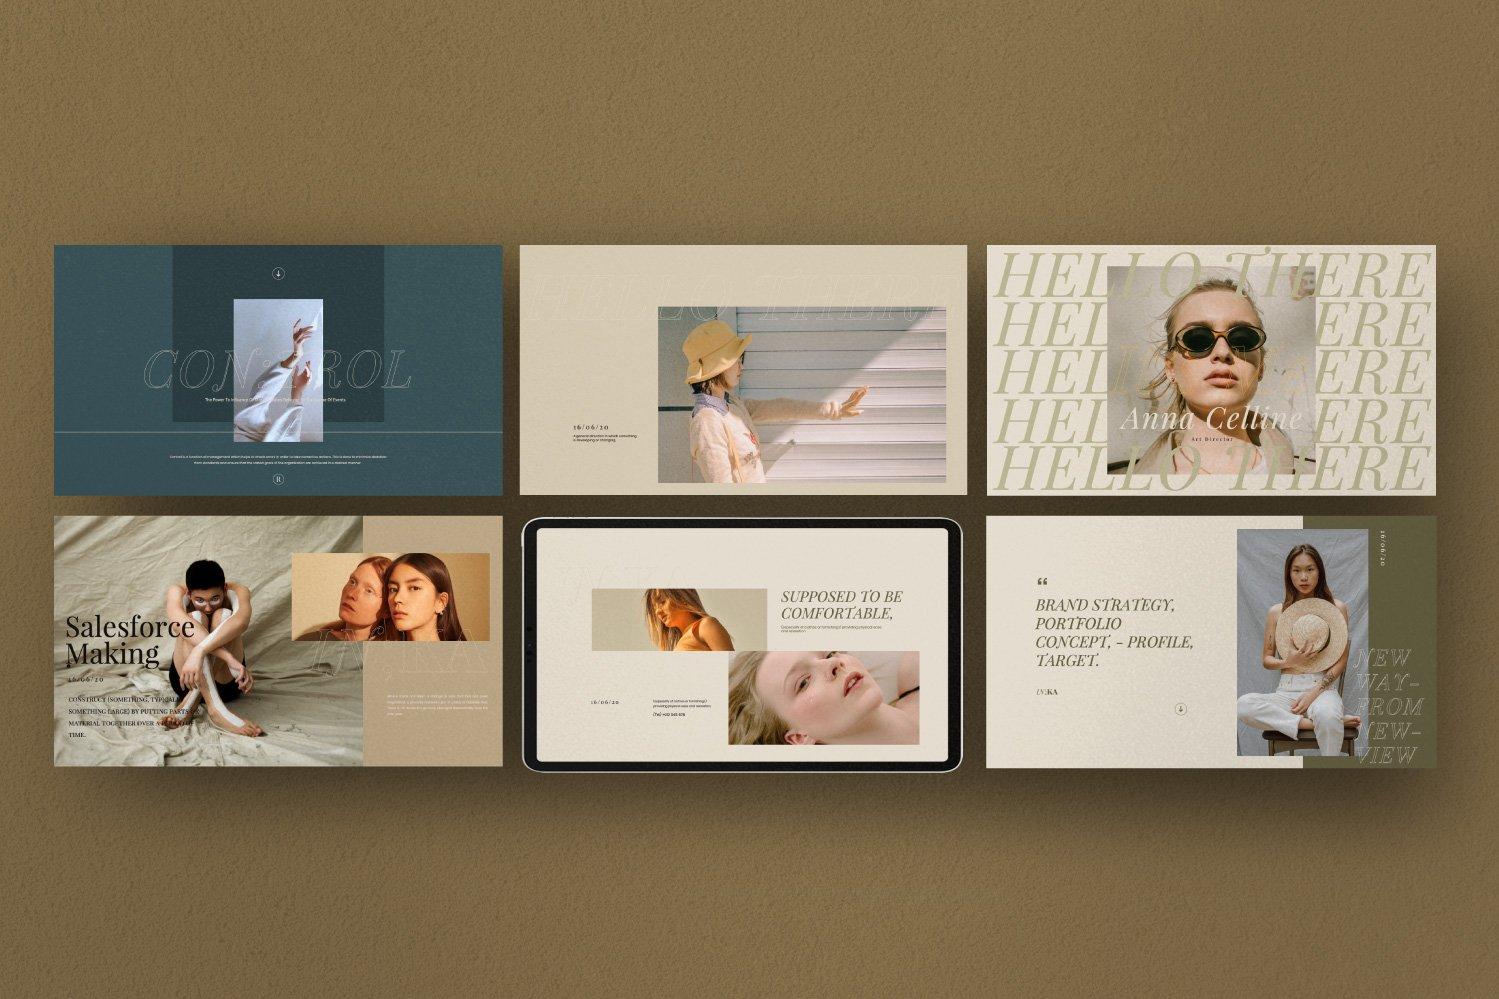 时尚创意服装摄影作品集幻灯片设计模板 Iconic – Fashion Lookbook PowerPoint插图(7)